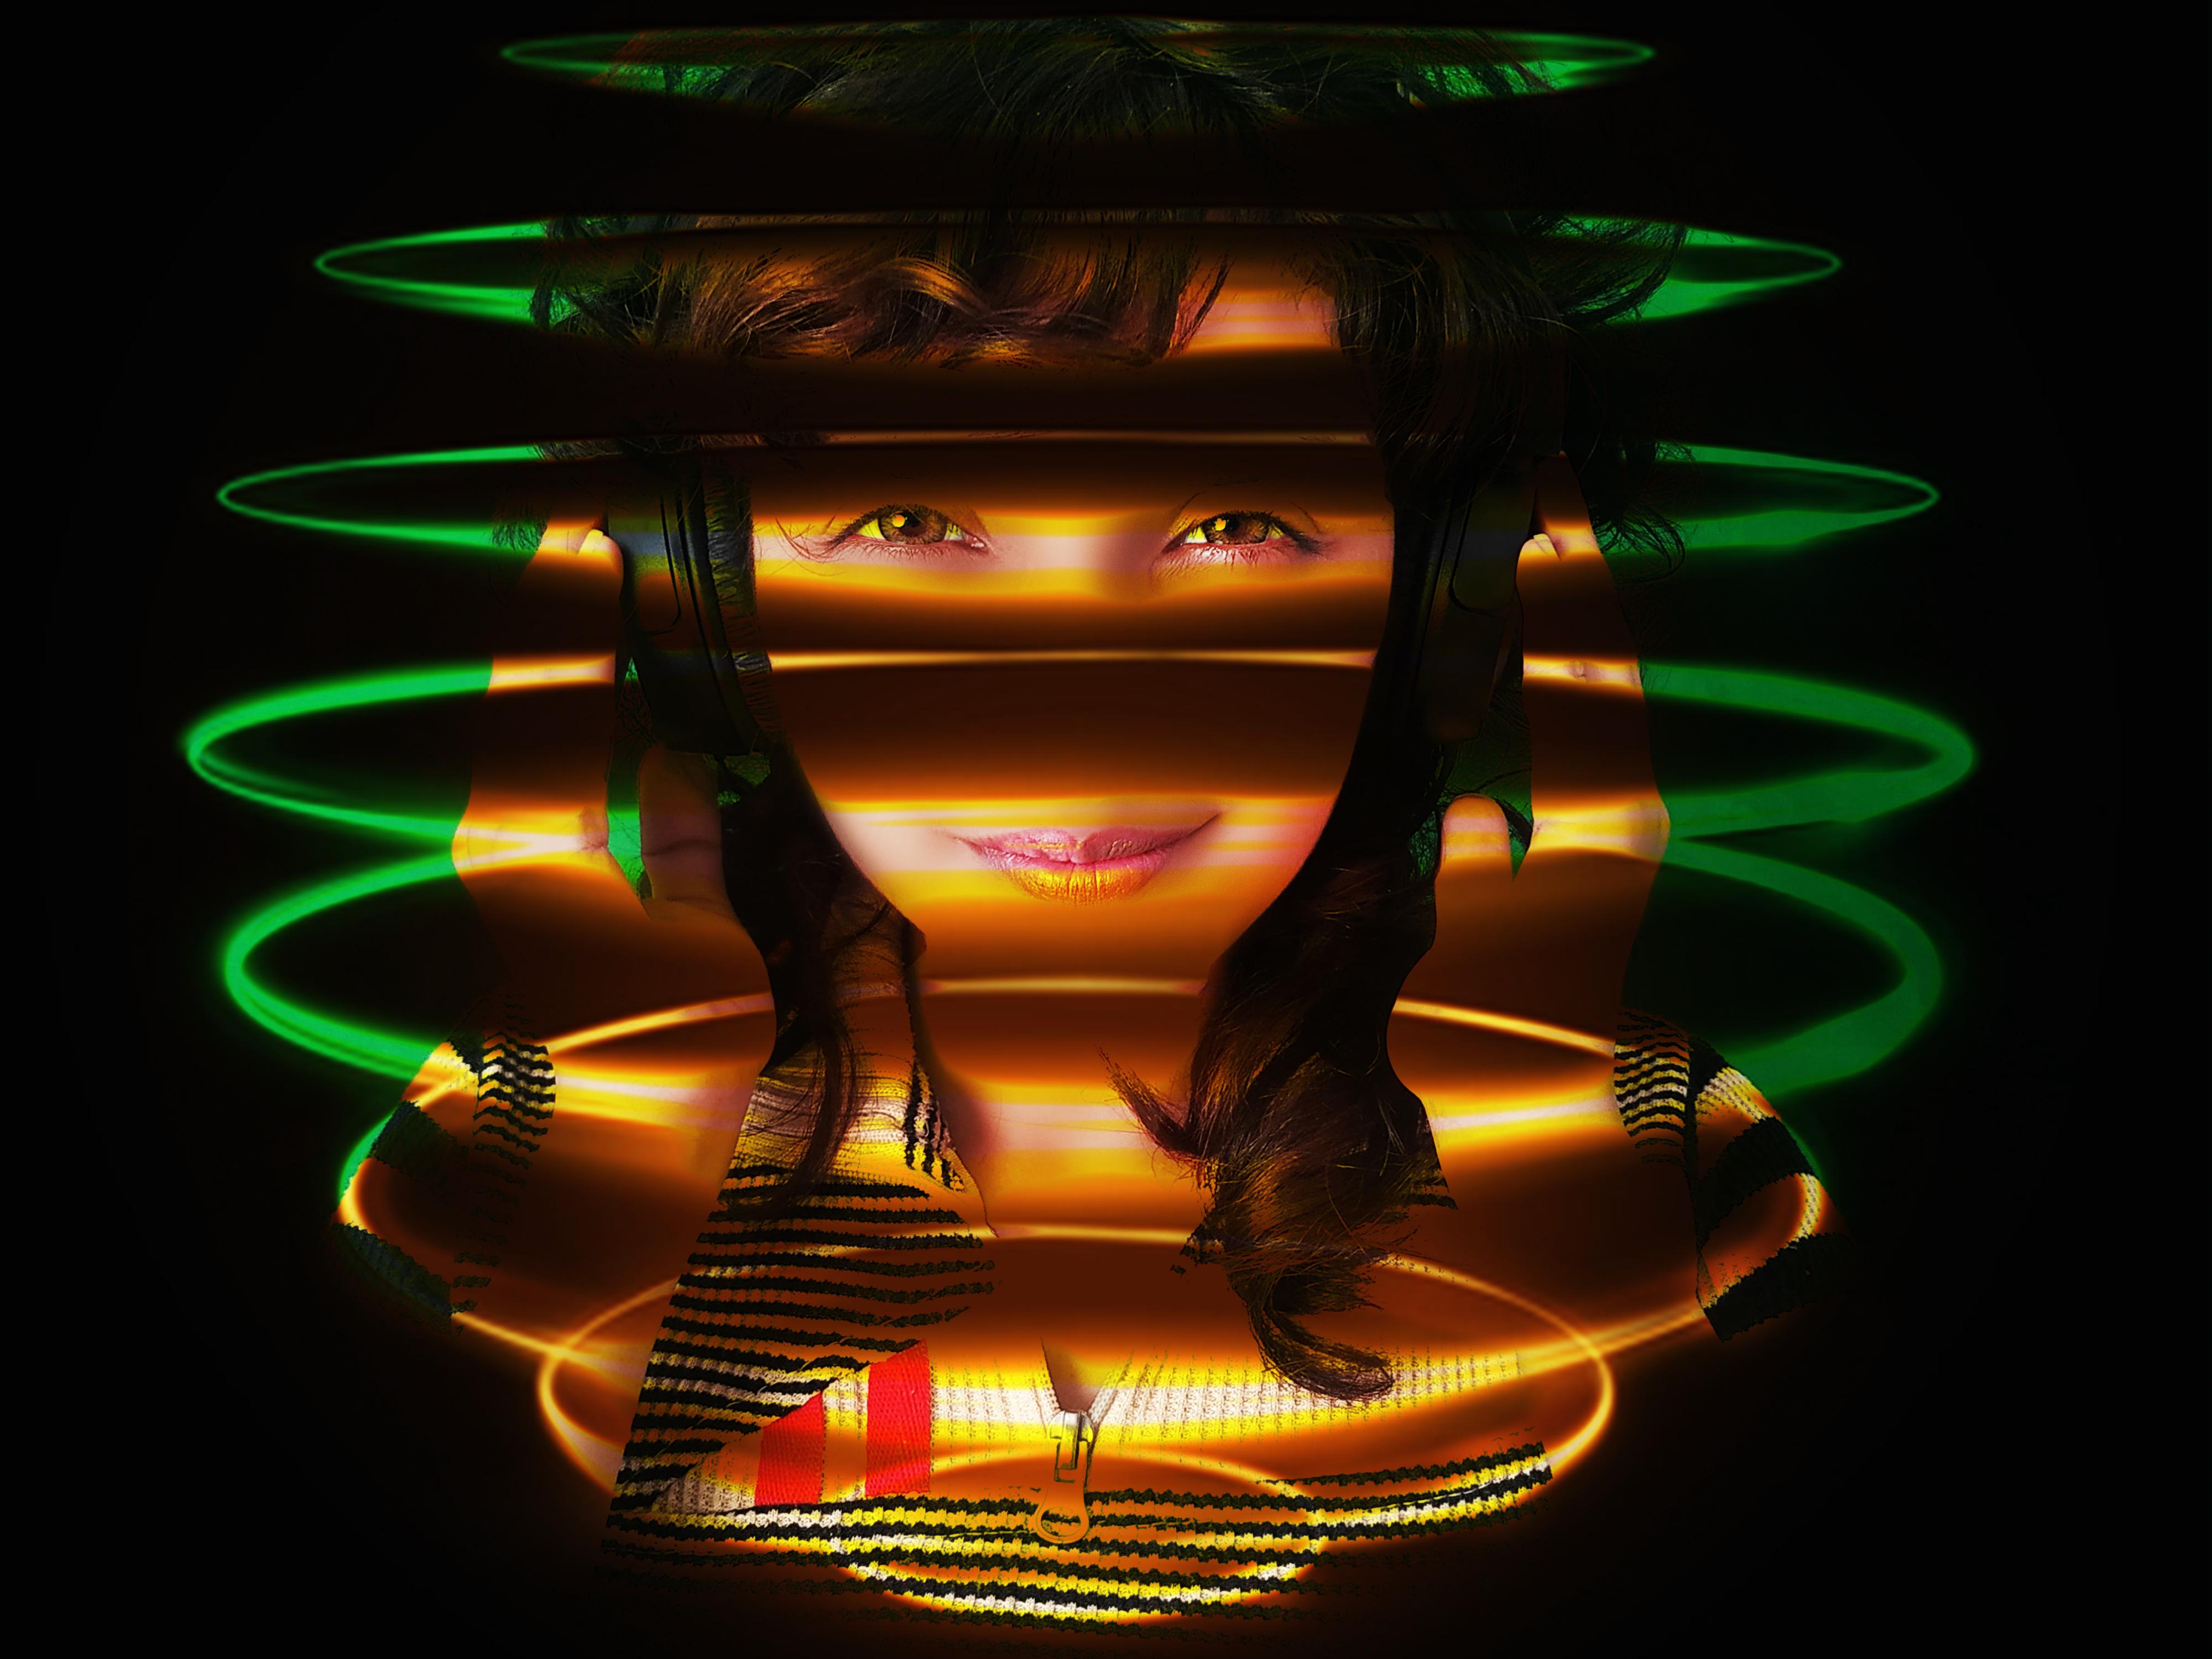 Girl dj with headphones enjoying in neon spiral rings, Girl dj with headphones enjoying in neon spiral rings